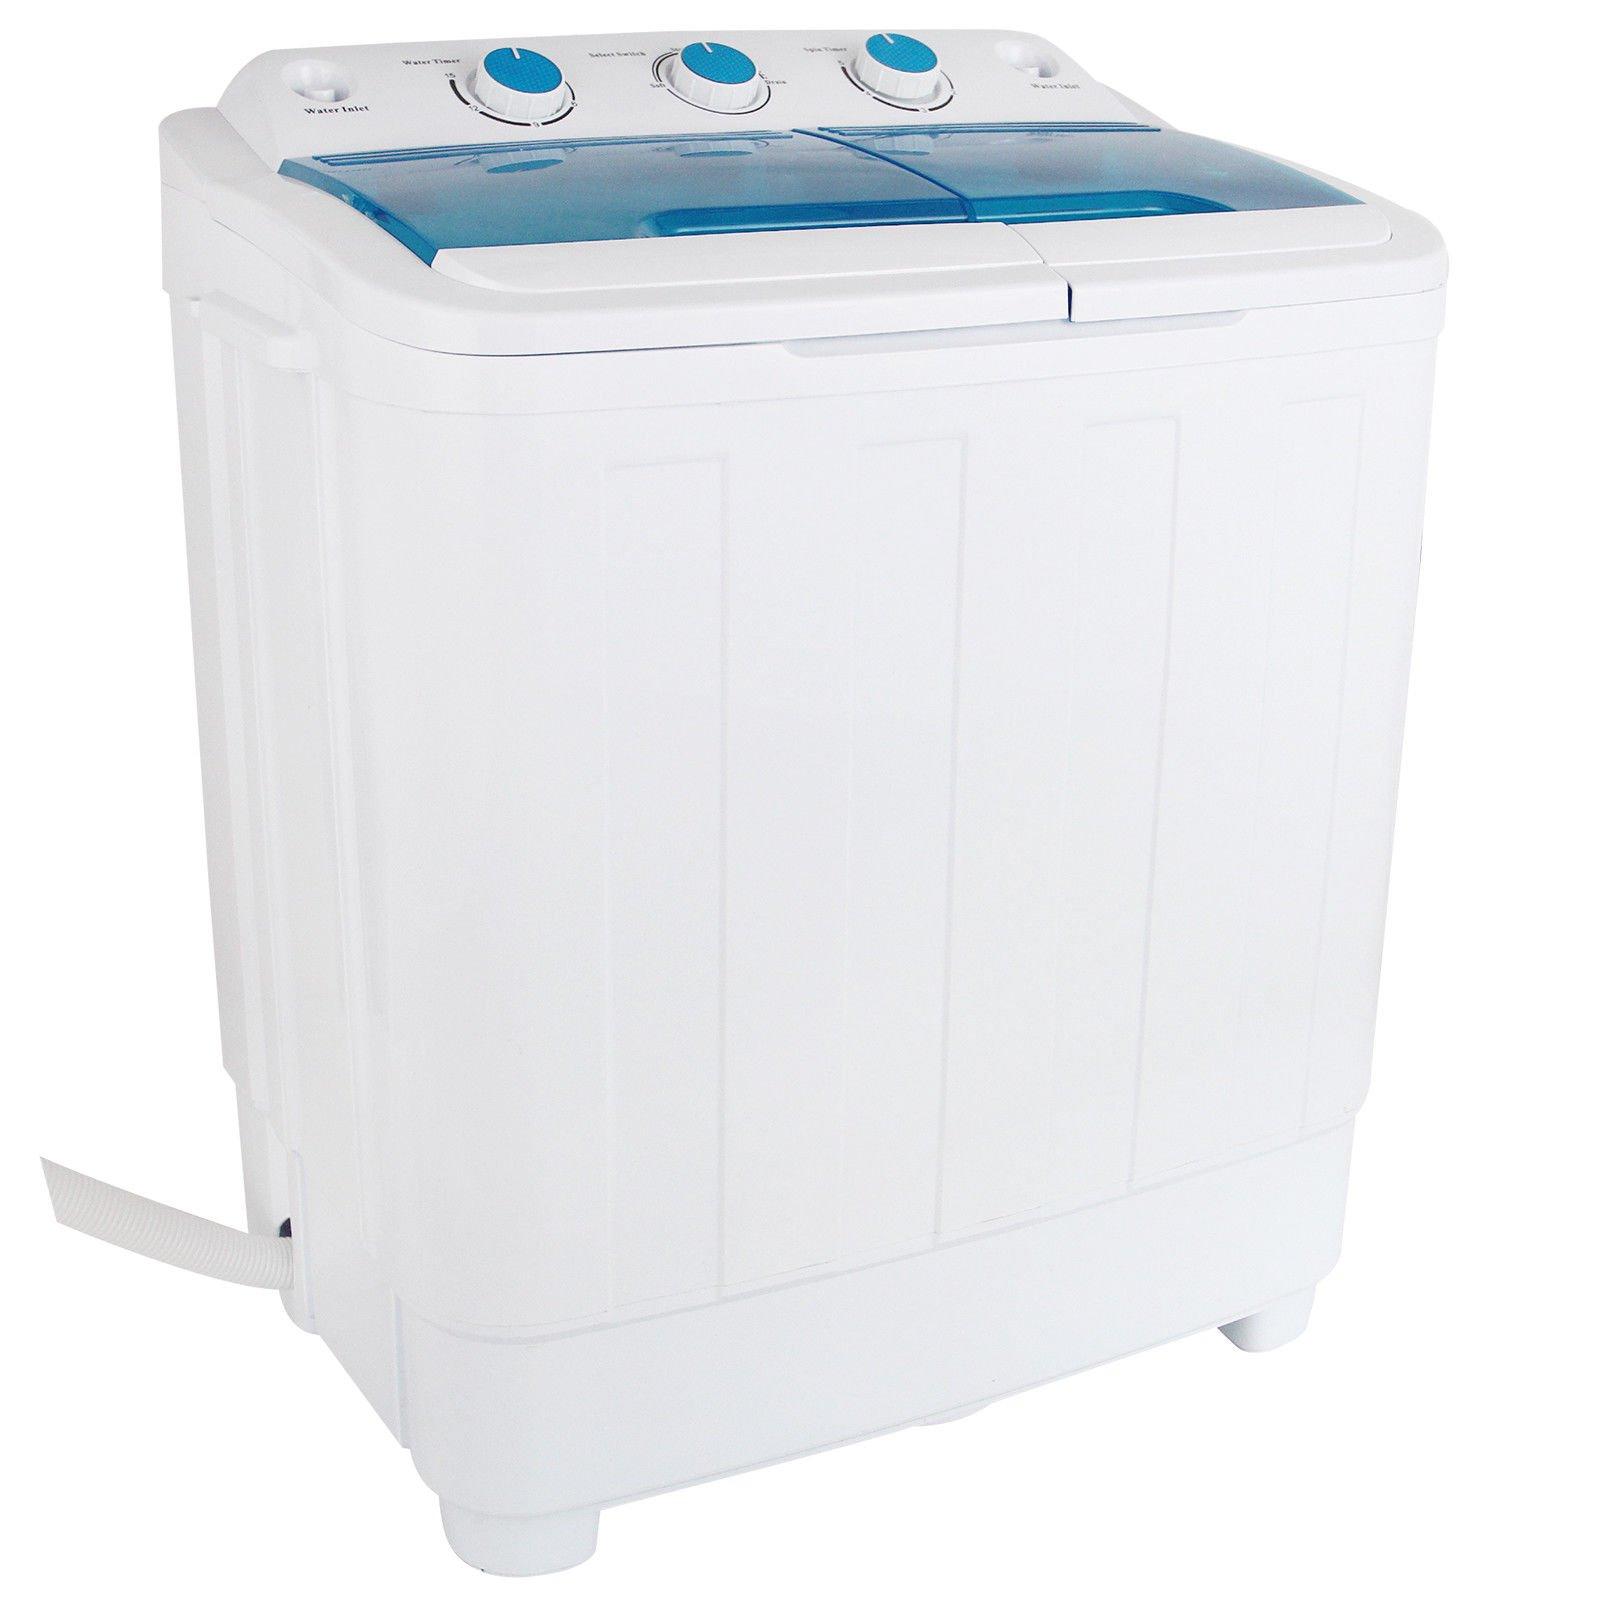 Lotus Analin 17LBS Mini Compact Portable Washing Machine Twin Tub Laundry Washer Spin Dryer